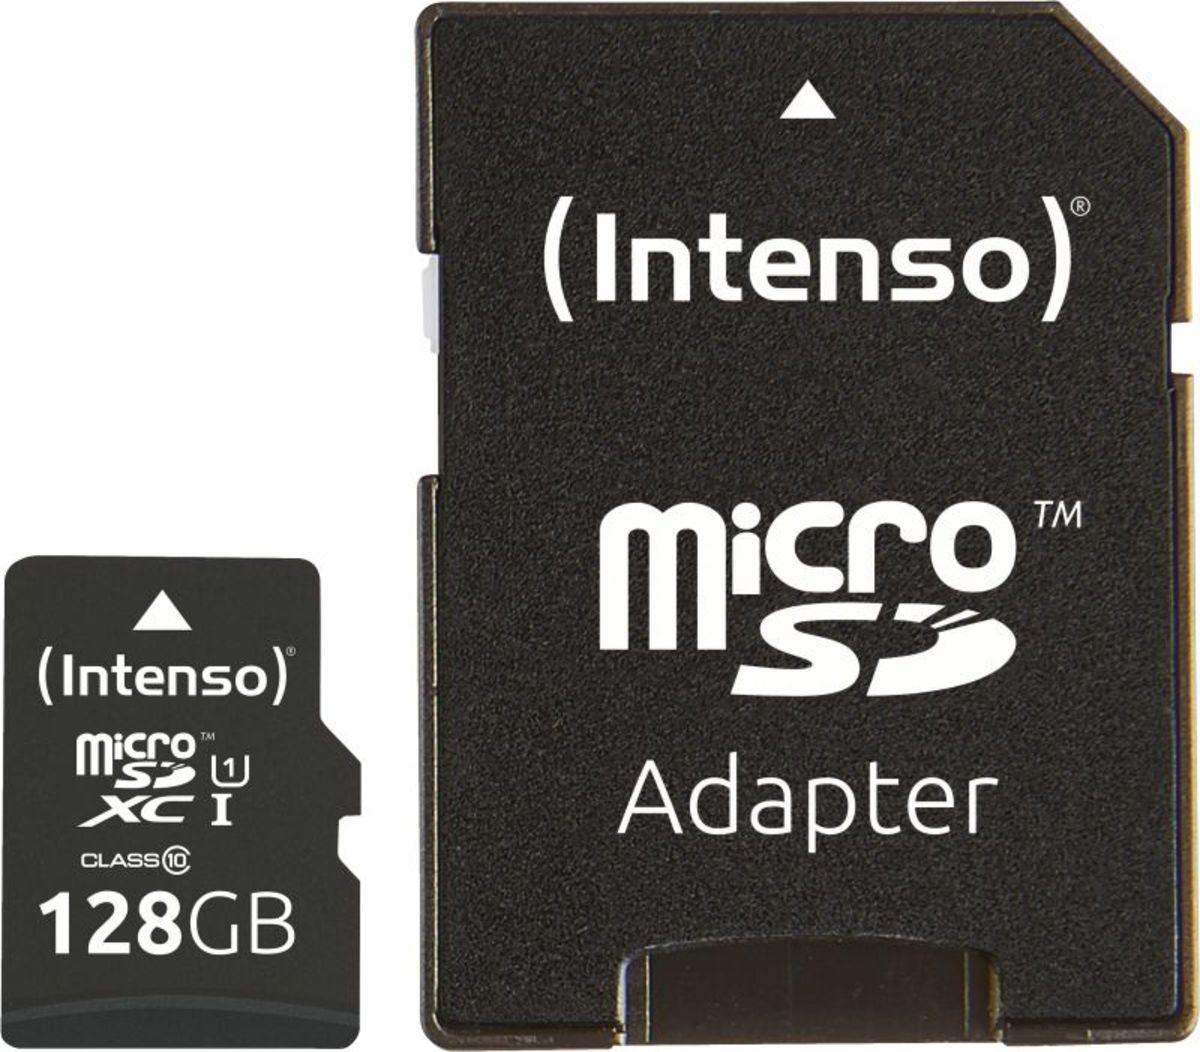 Bild 1 von Intenso Micro SD-XC Karte 128GB UHS-I Premium